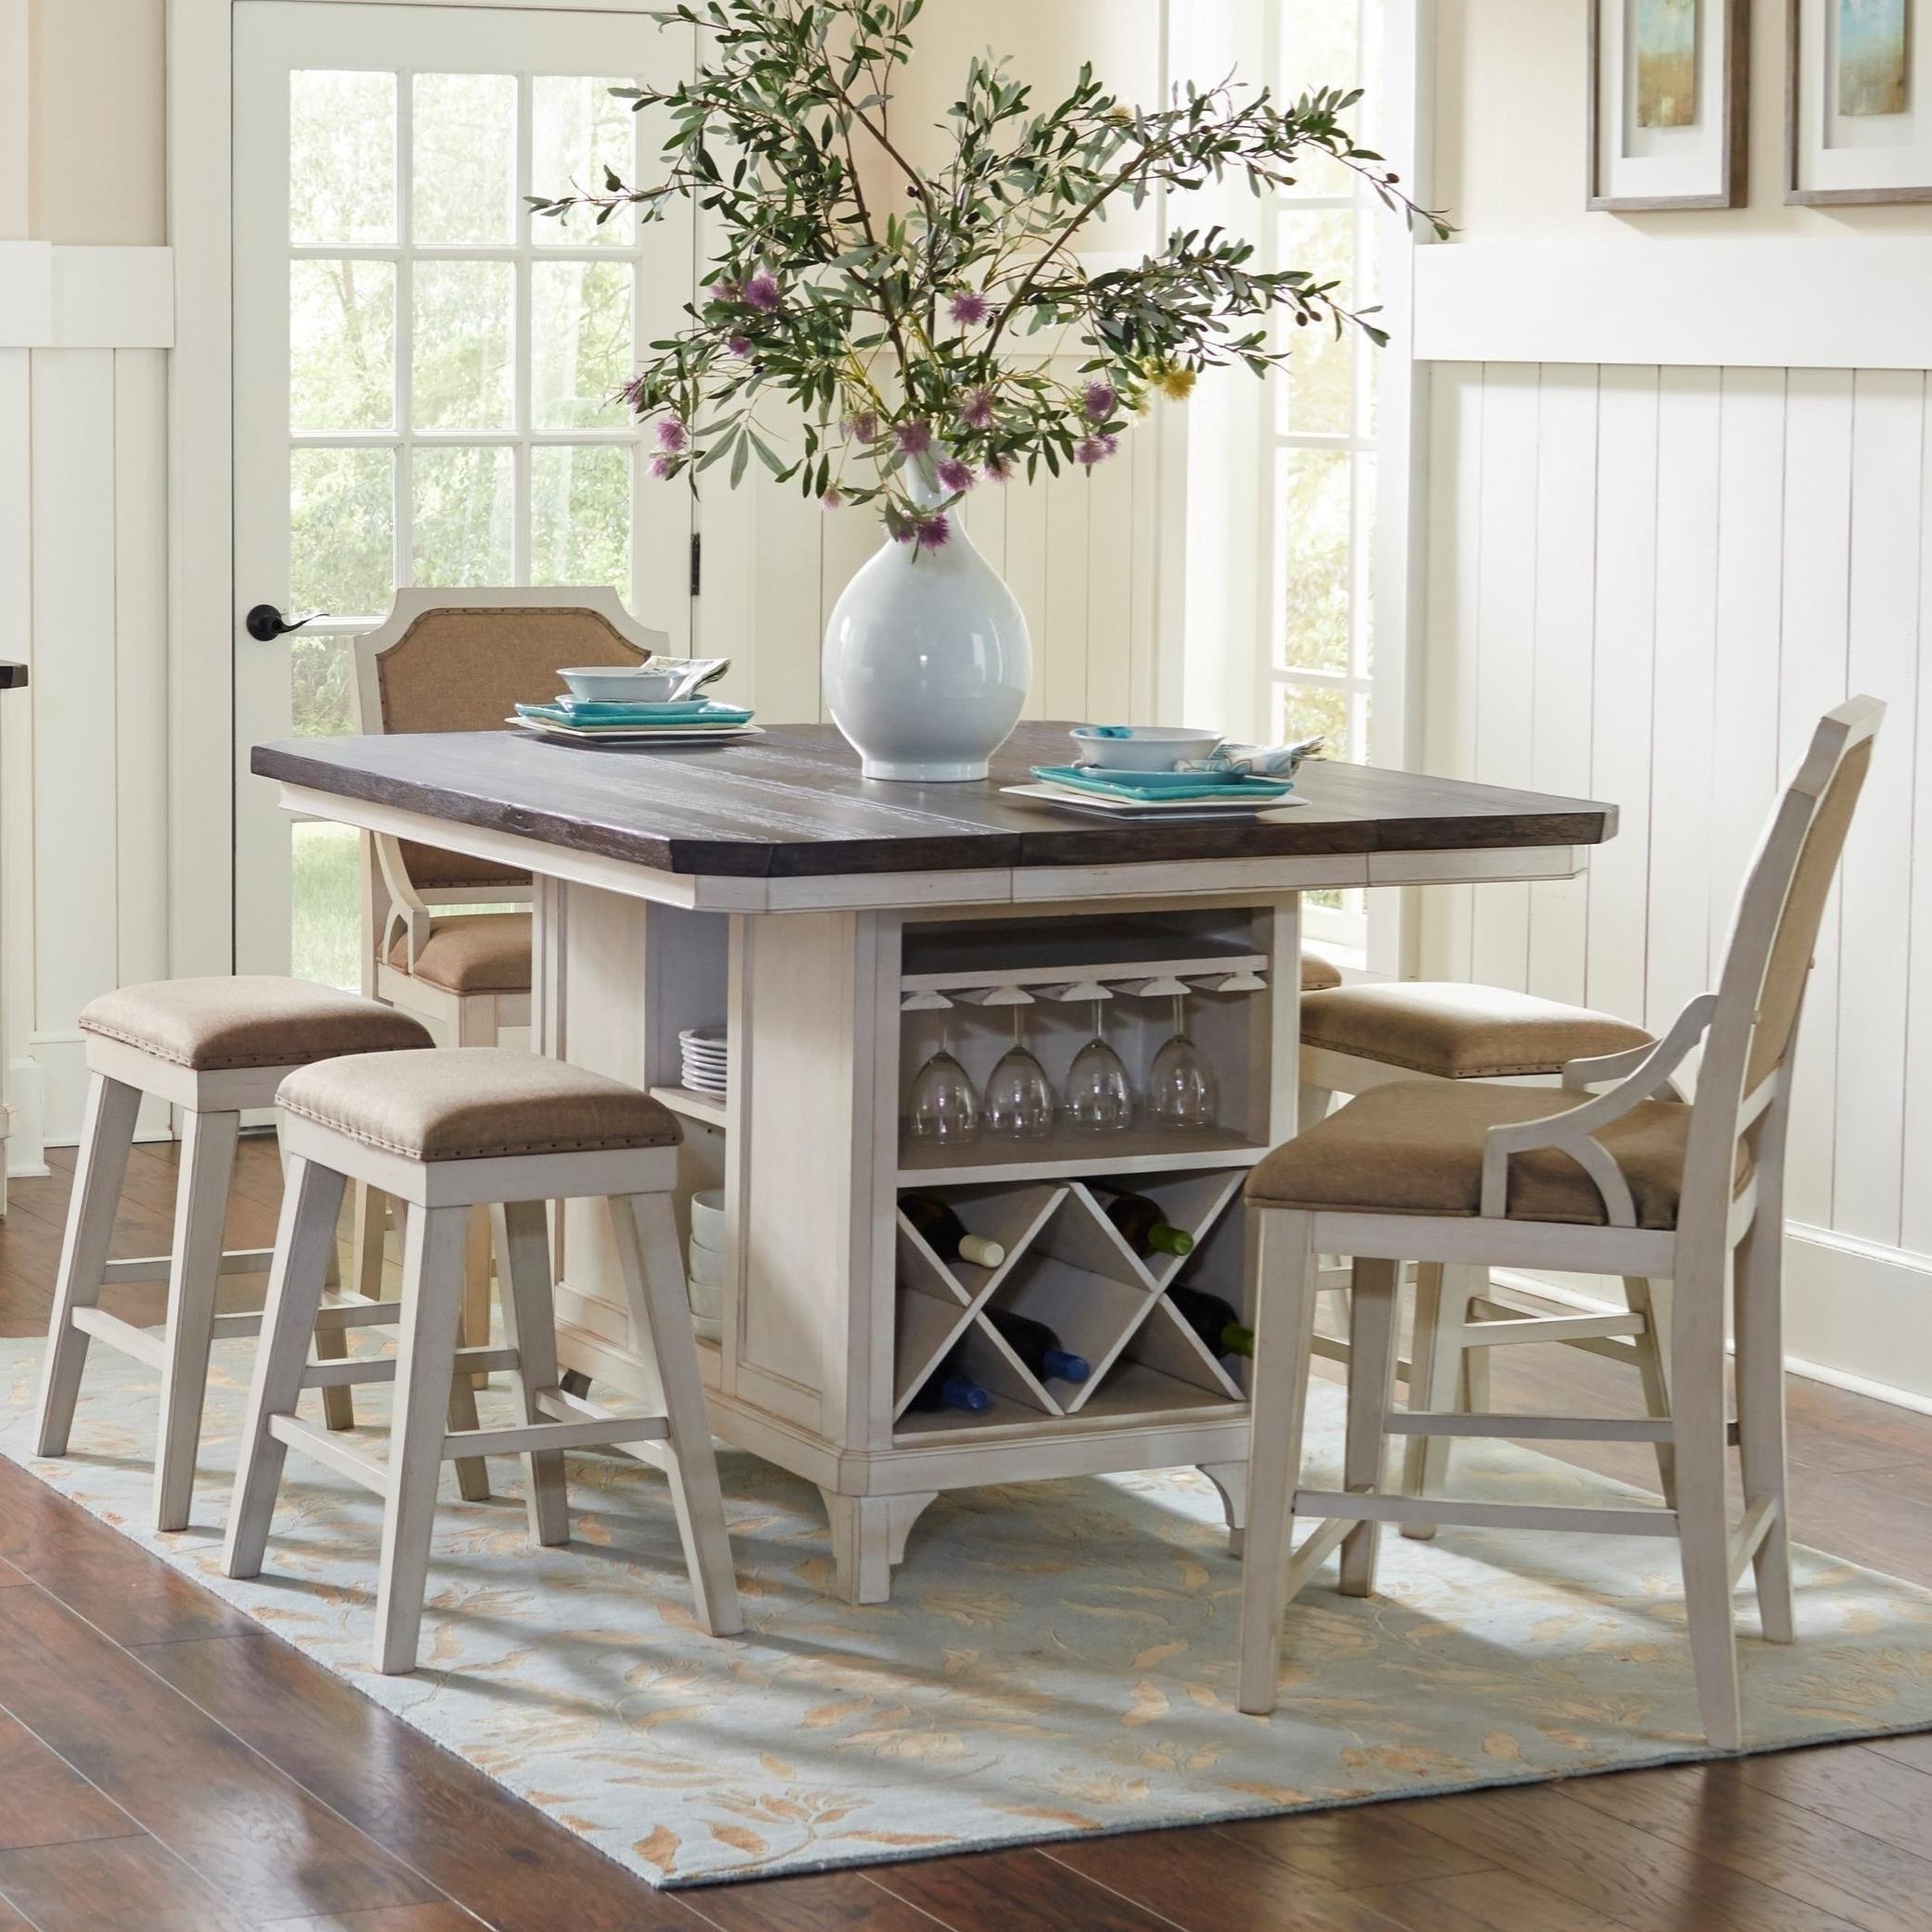 Avalon Furniture Mystic Cay 7 Piece Kitchen Island Table Set Zak's